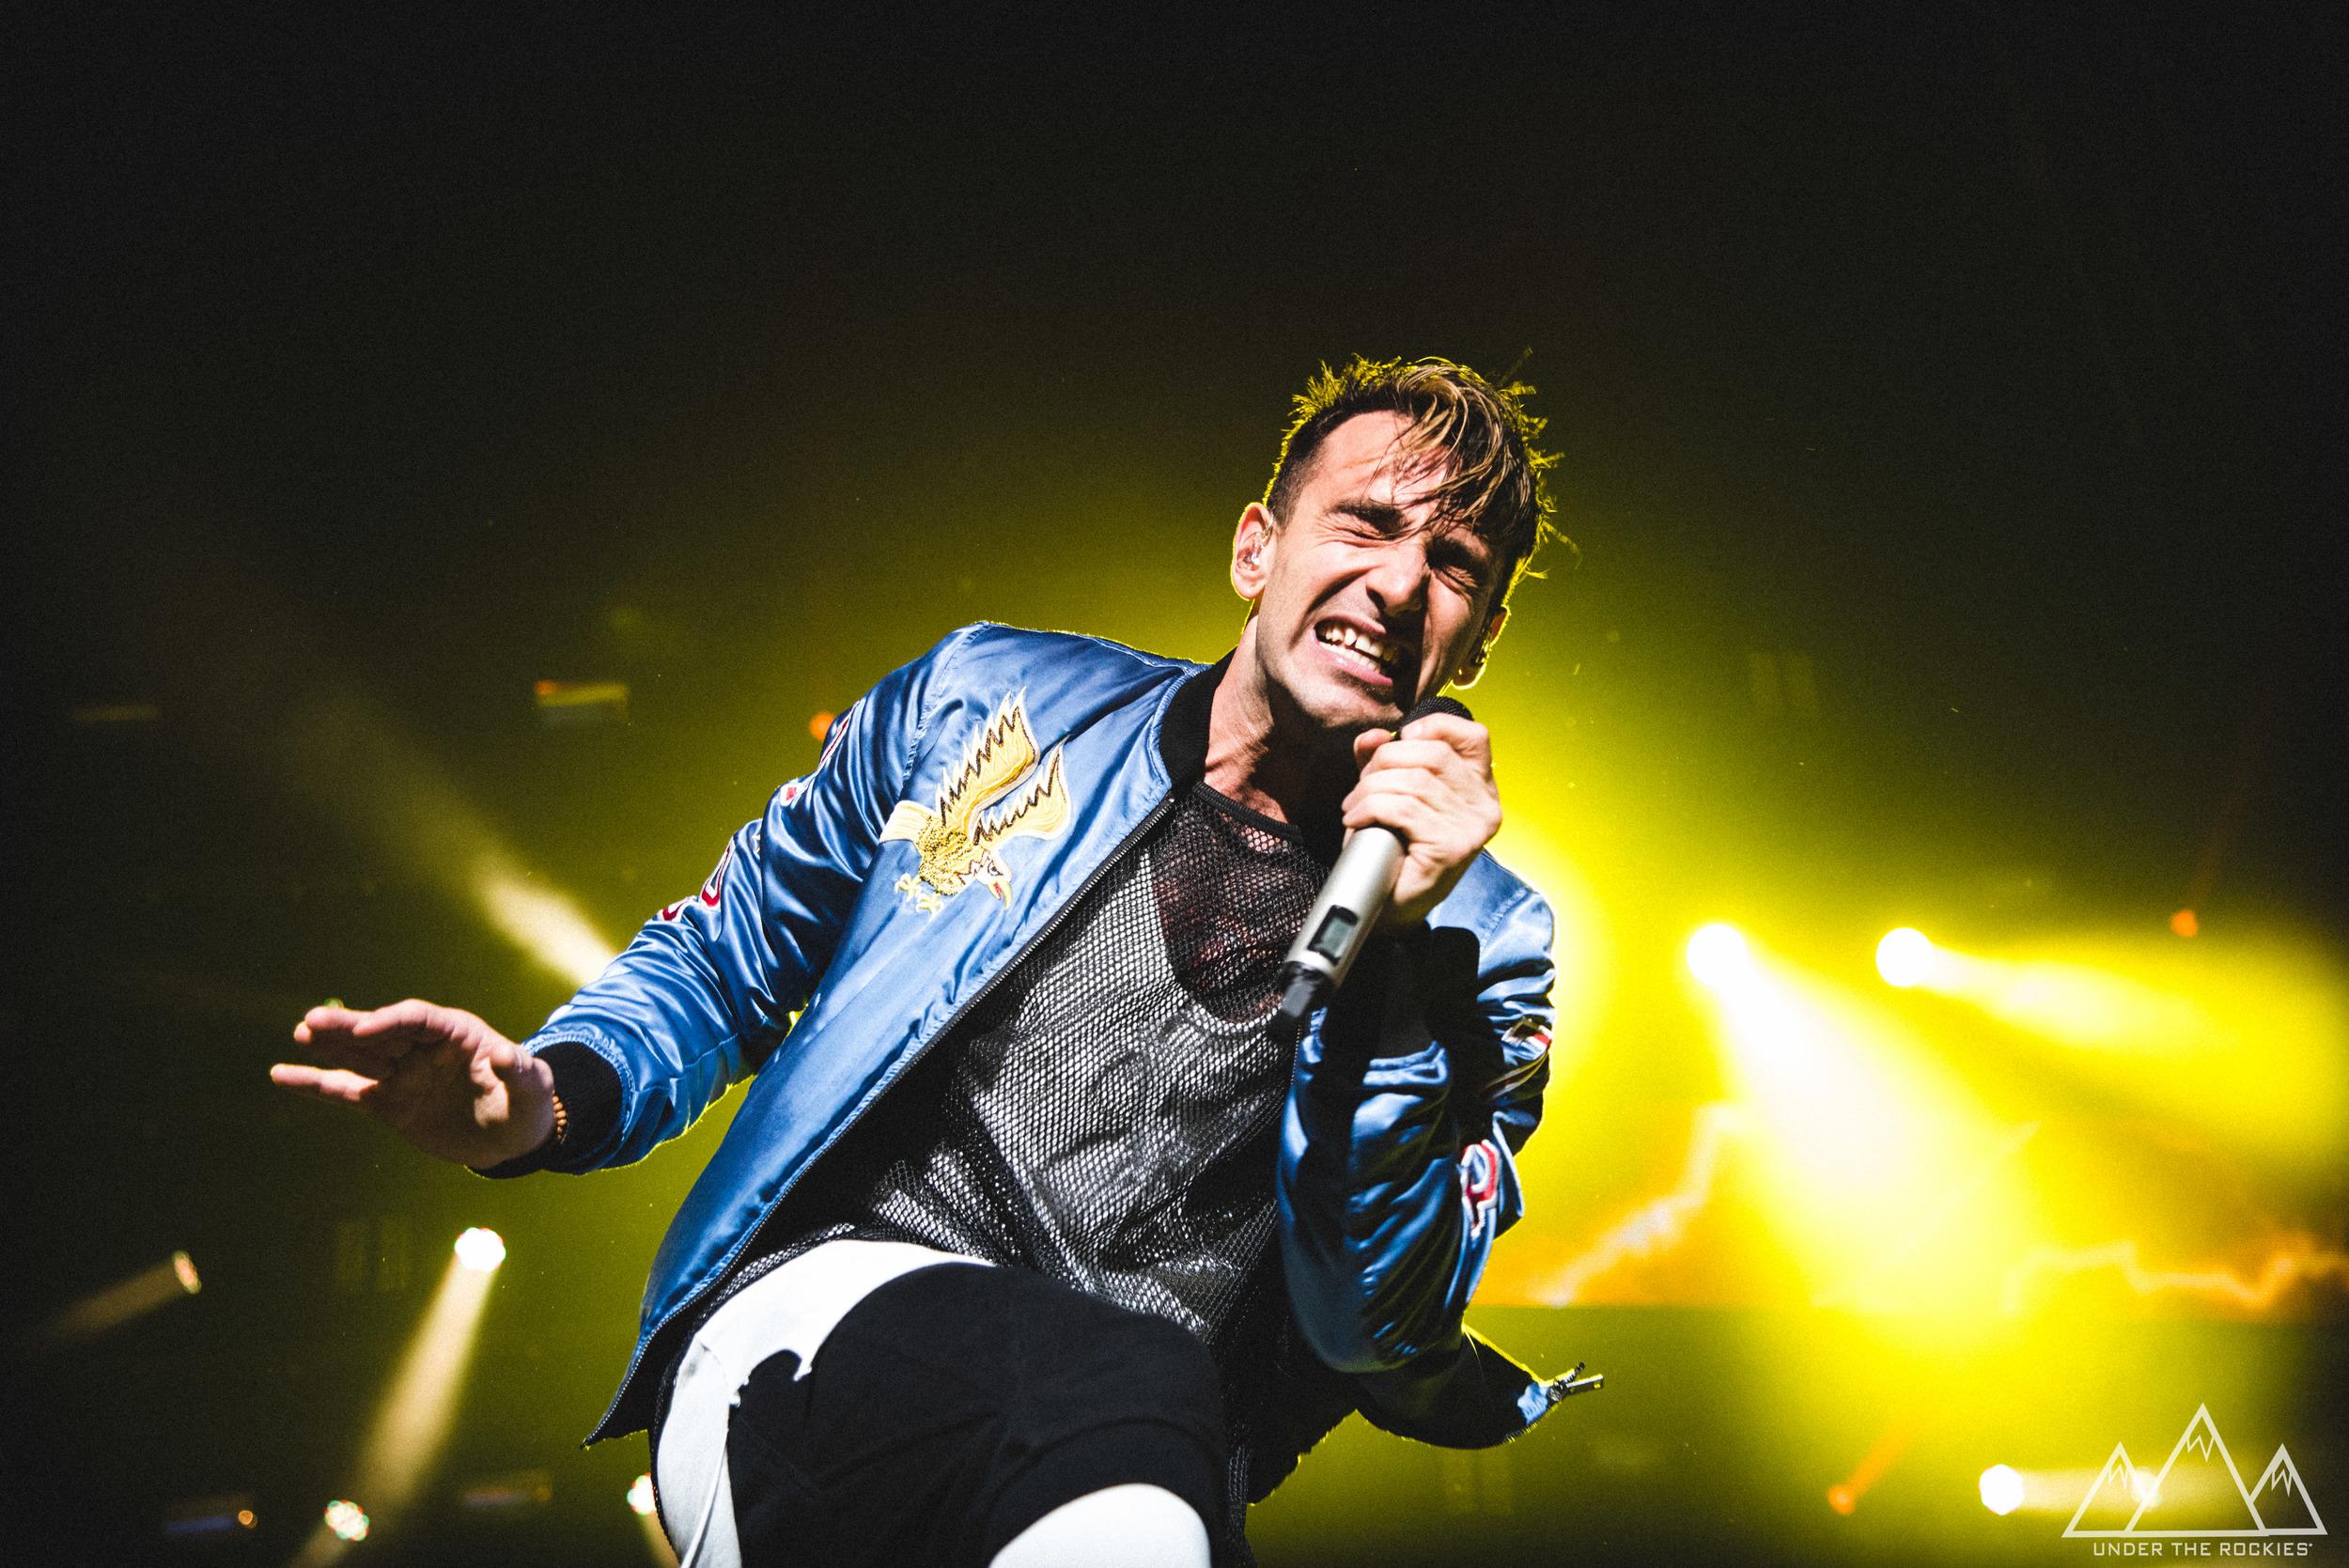 Jacob Hoggard, lead singer of Hedley, performing in Calgary, AB. Photos and review below by Josh Platt.